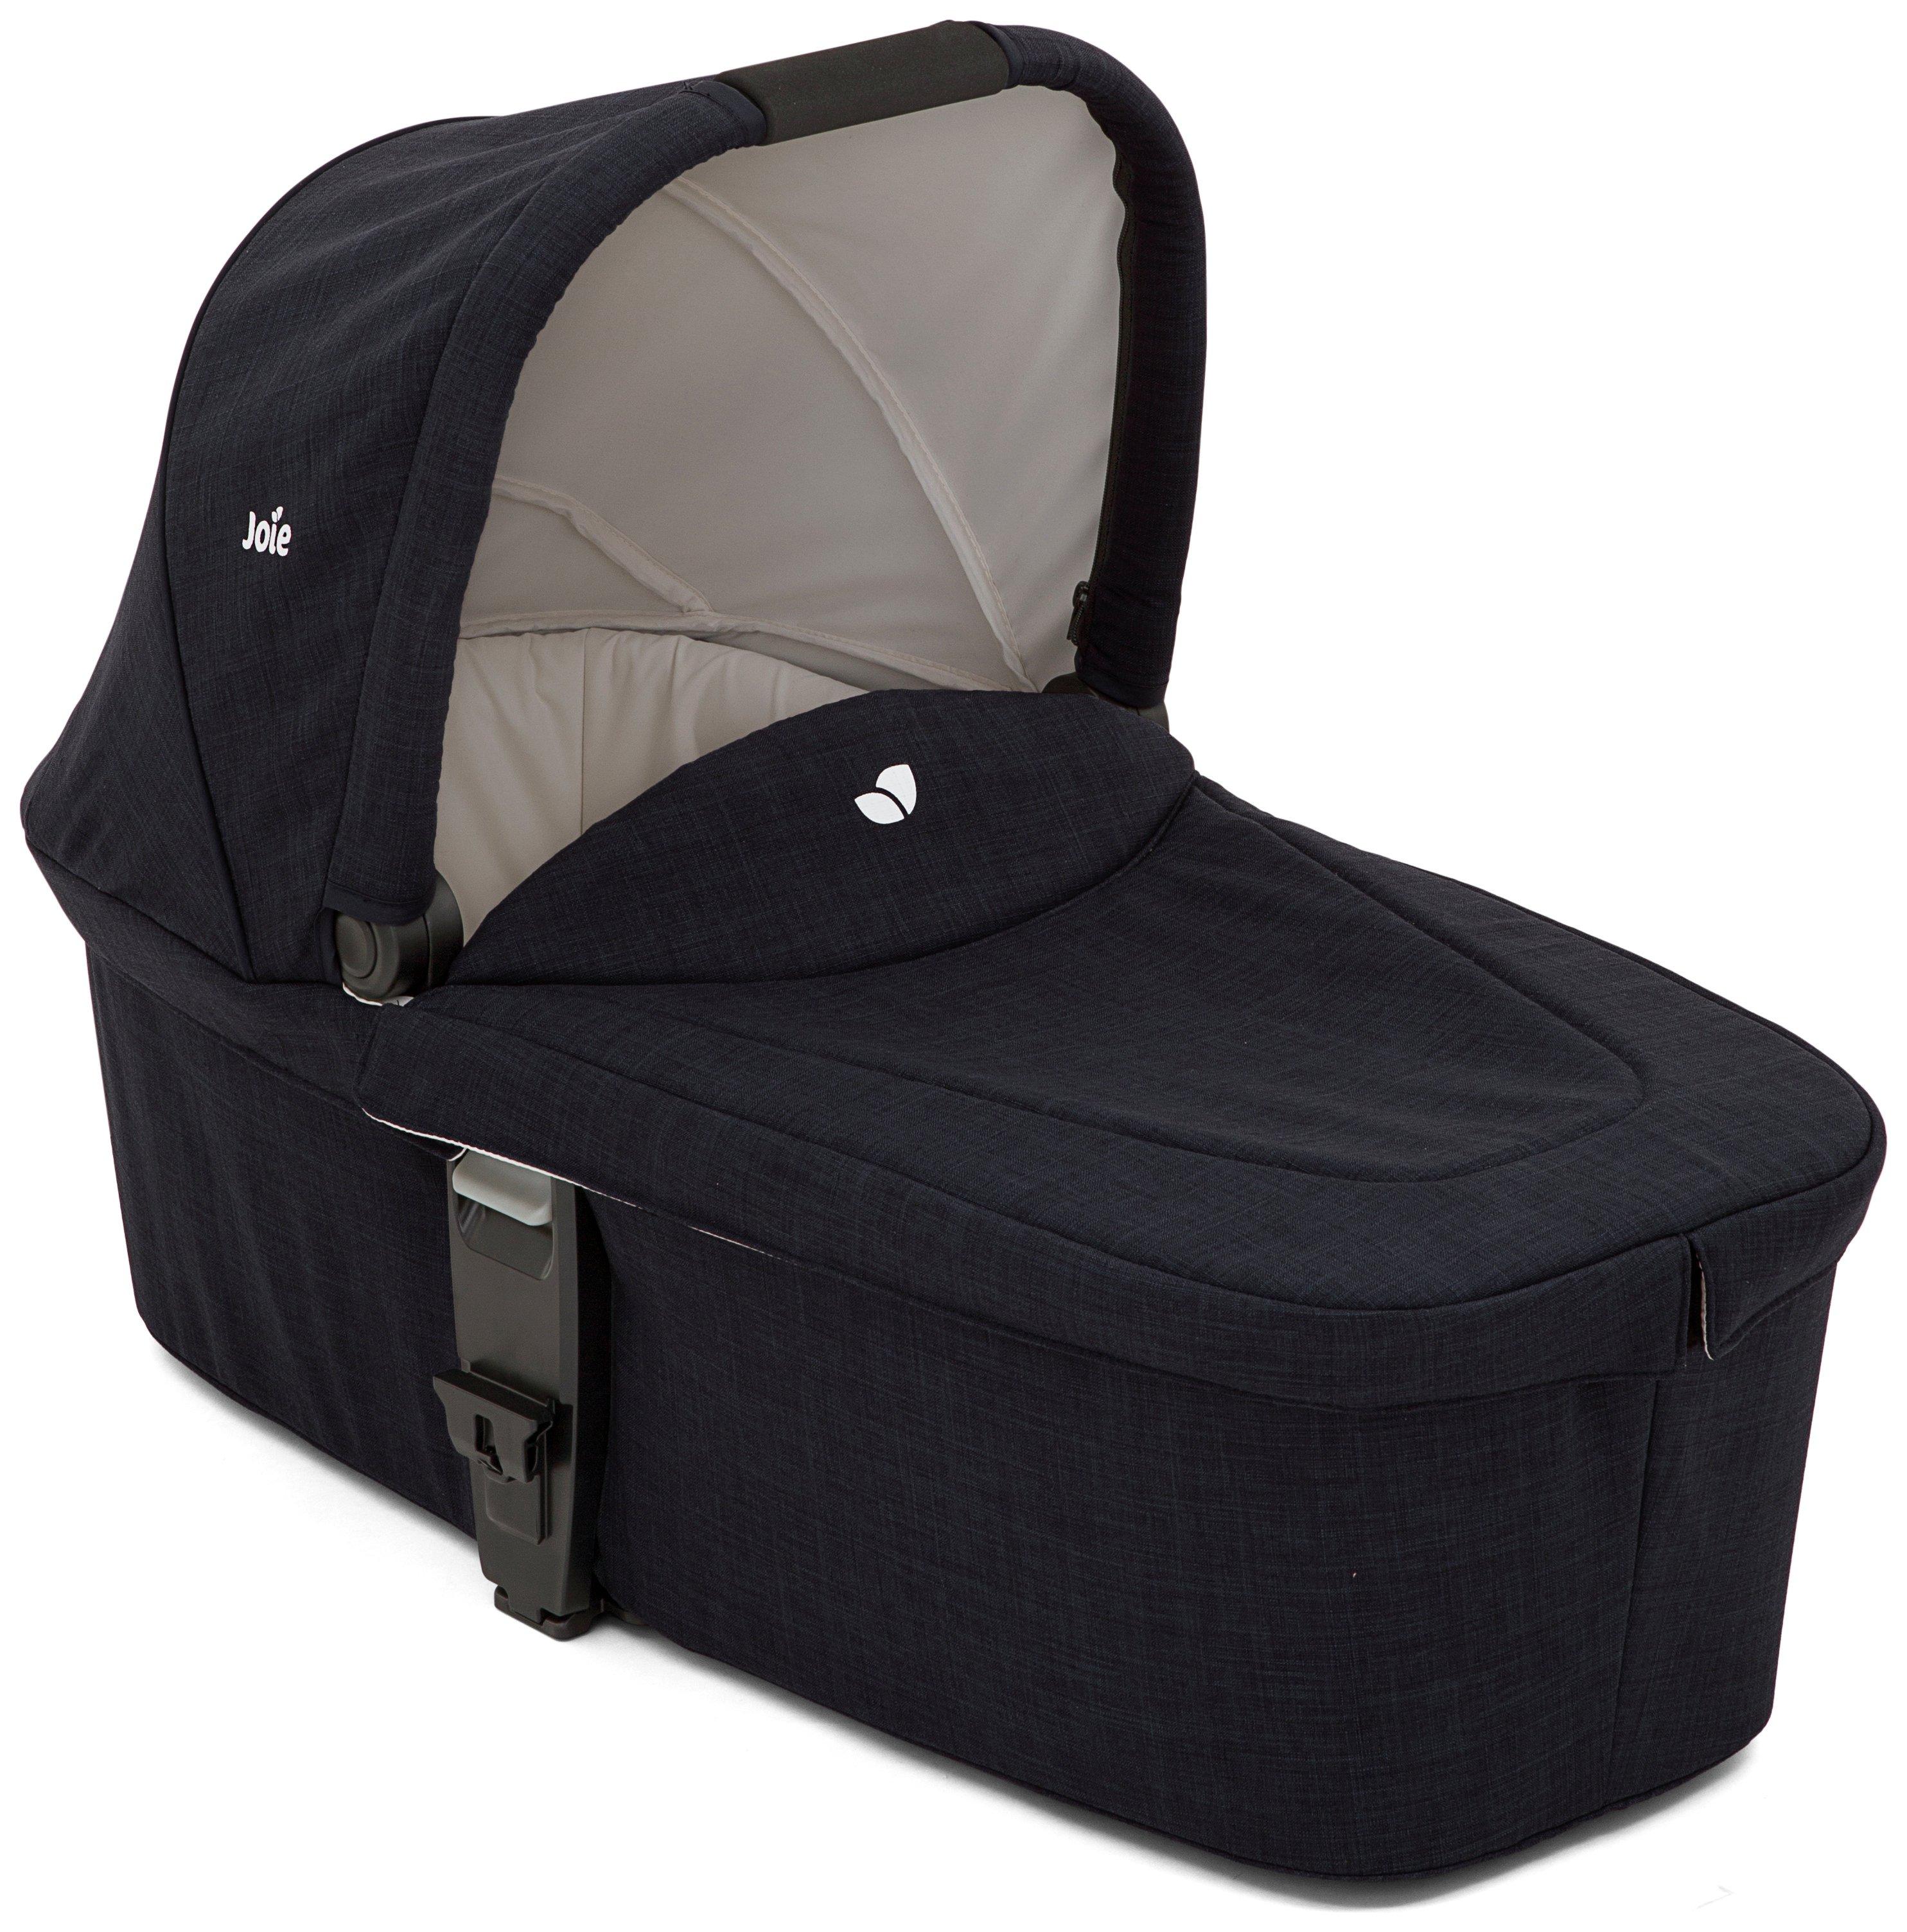 Joie Navy Blazer Chrome DLX Carry Cot